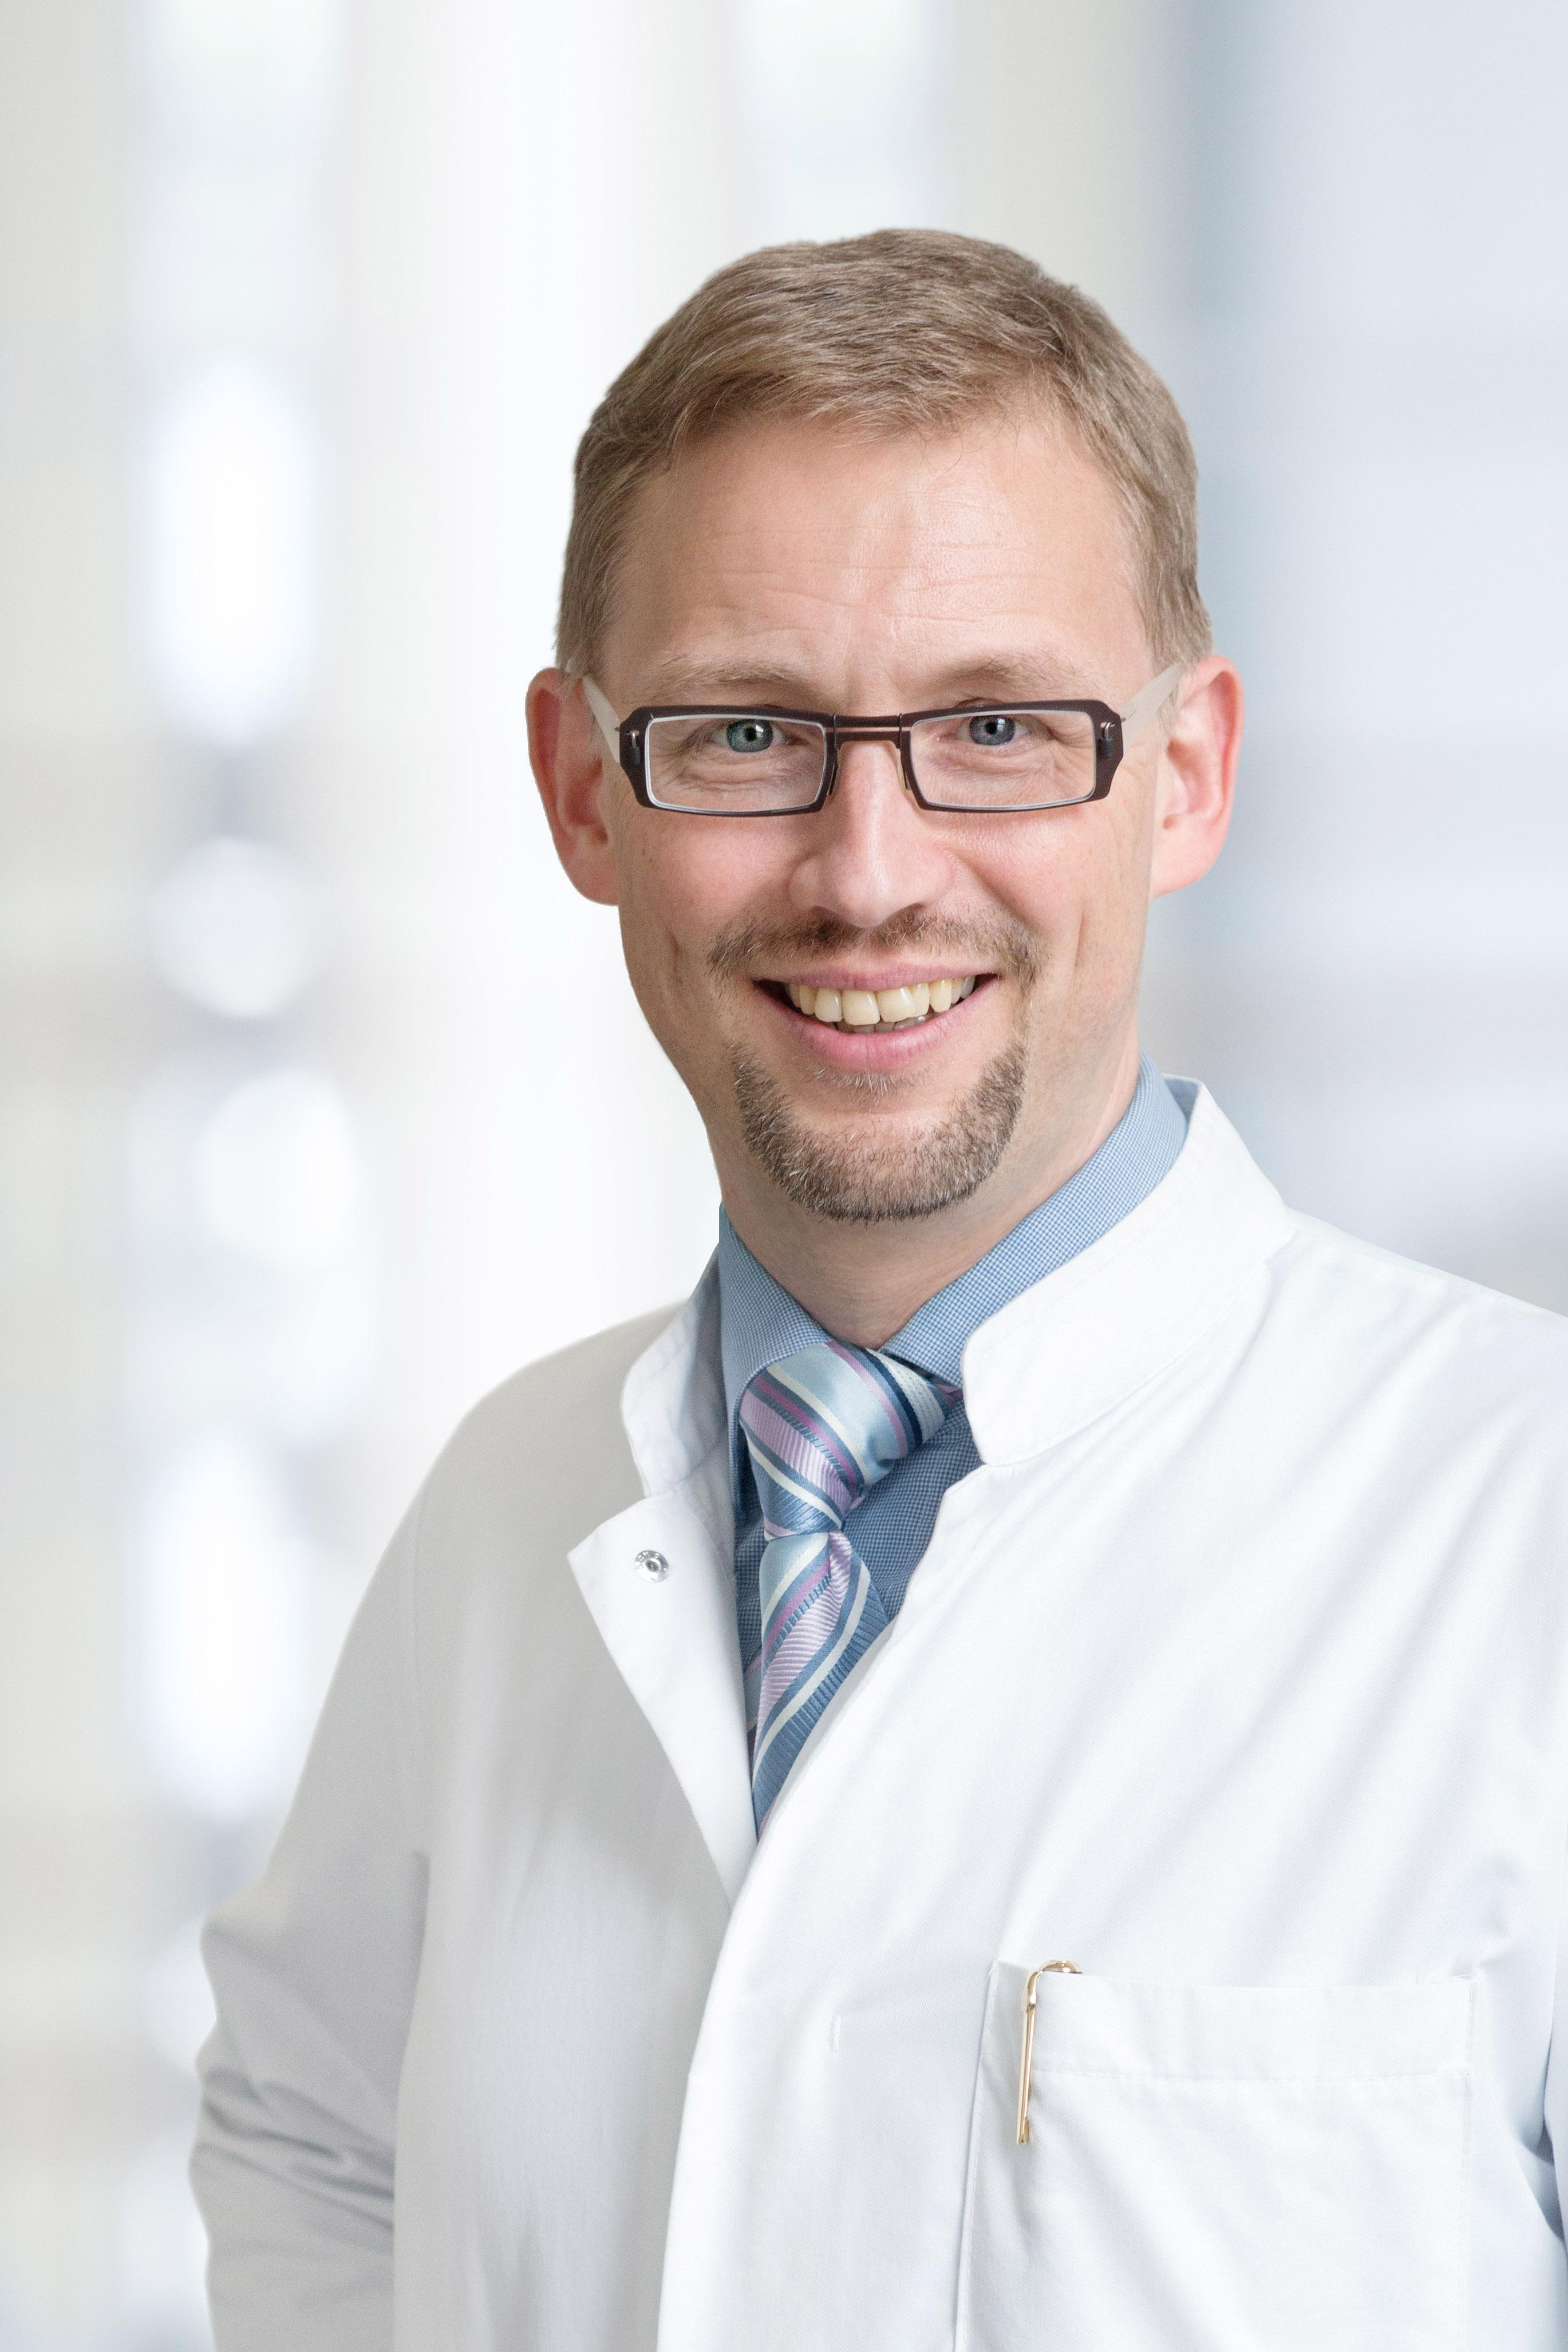 Prof. Michael Fuchs Portraifoto UKL, S. Straube